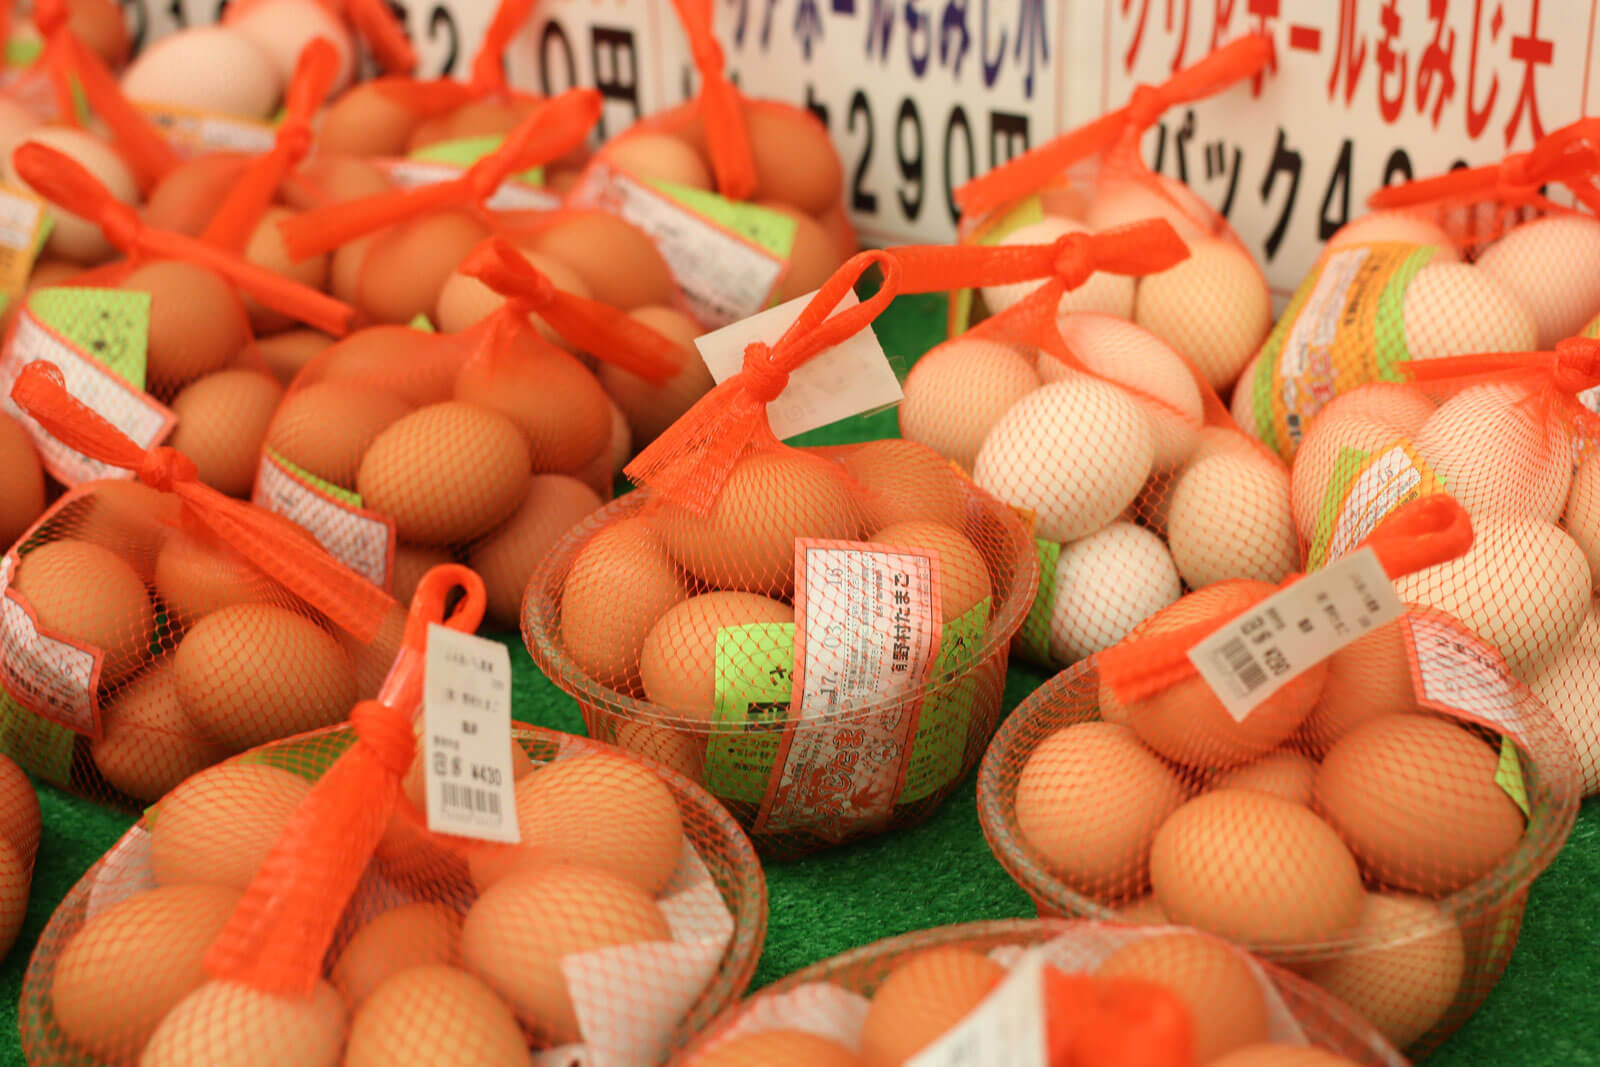 JAあいち尾東 豊明フレッシュセンター 陳列された卵